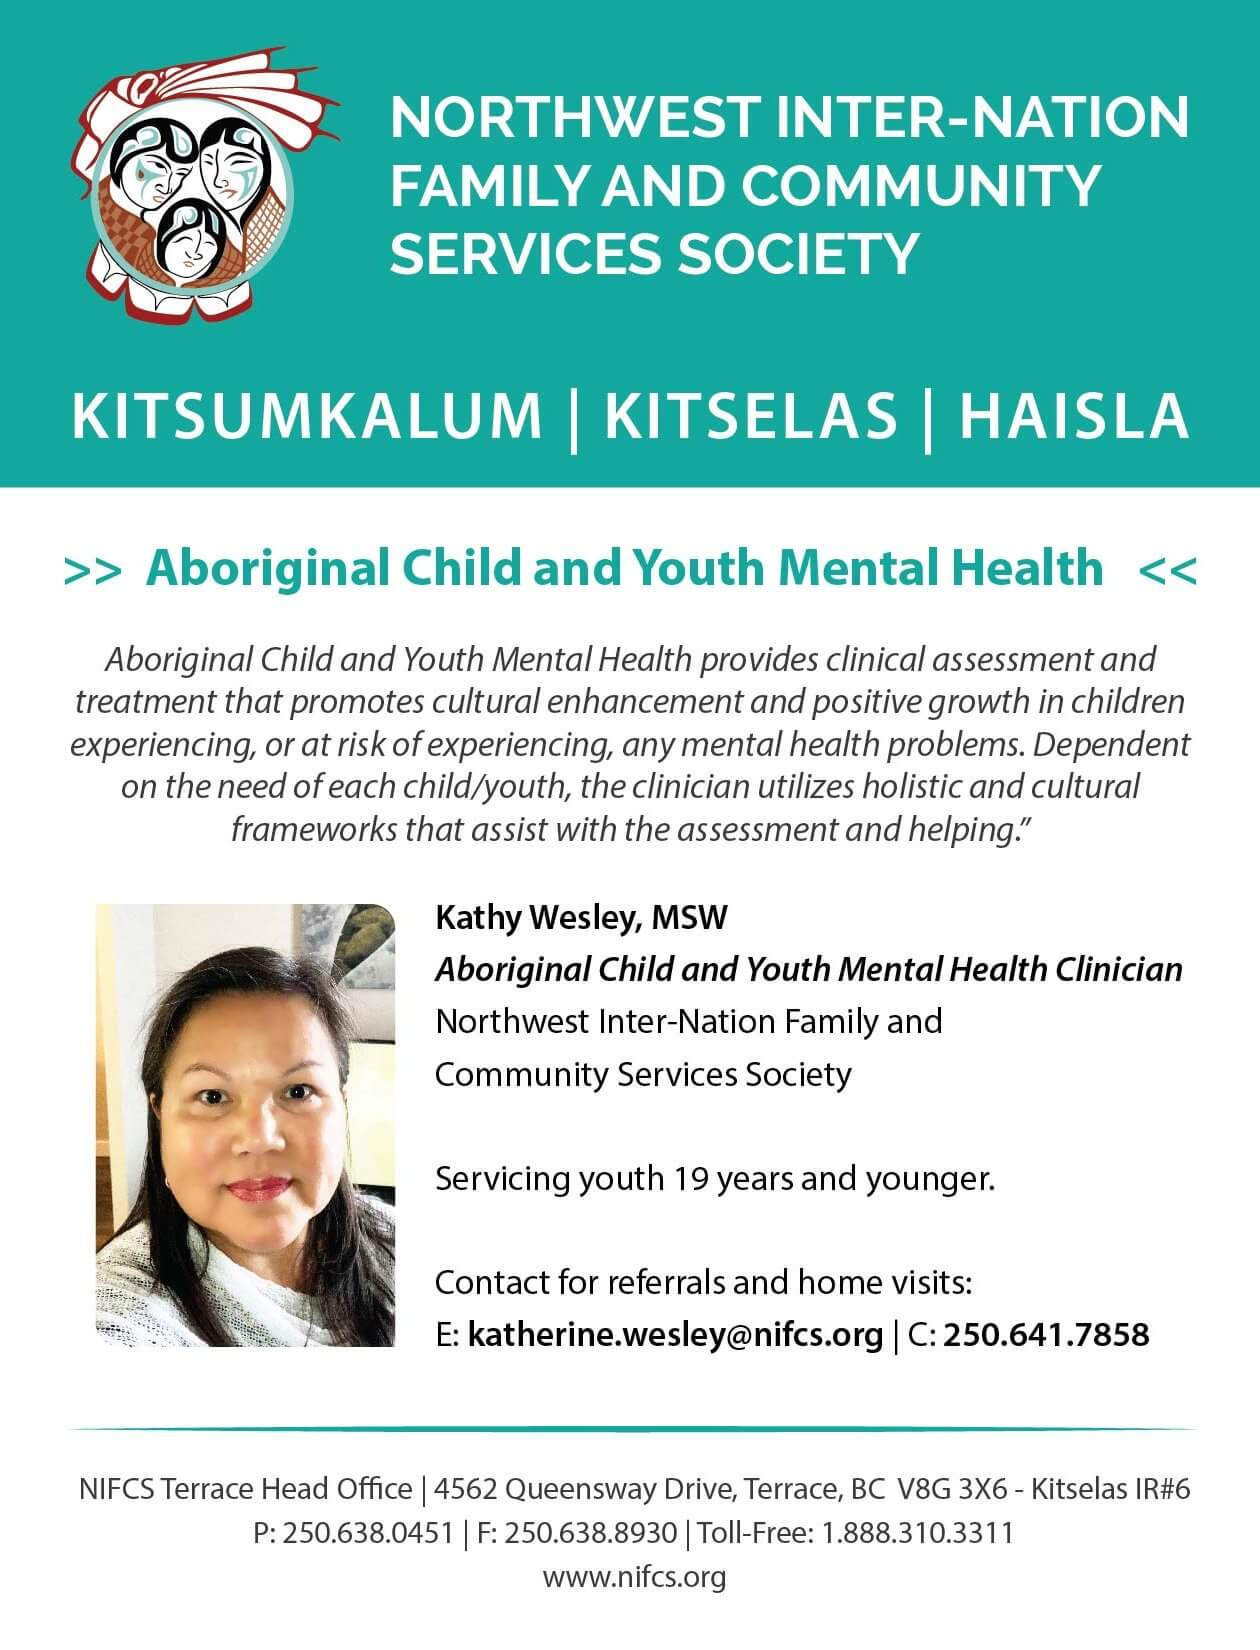 Aboriginal Child And Youth Mental Health Nifcs Kitsumkalum A Galts Ap Community Of The Tsimshian Nation